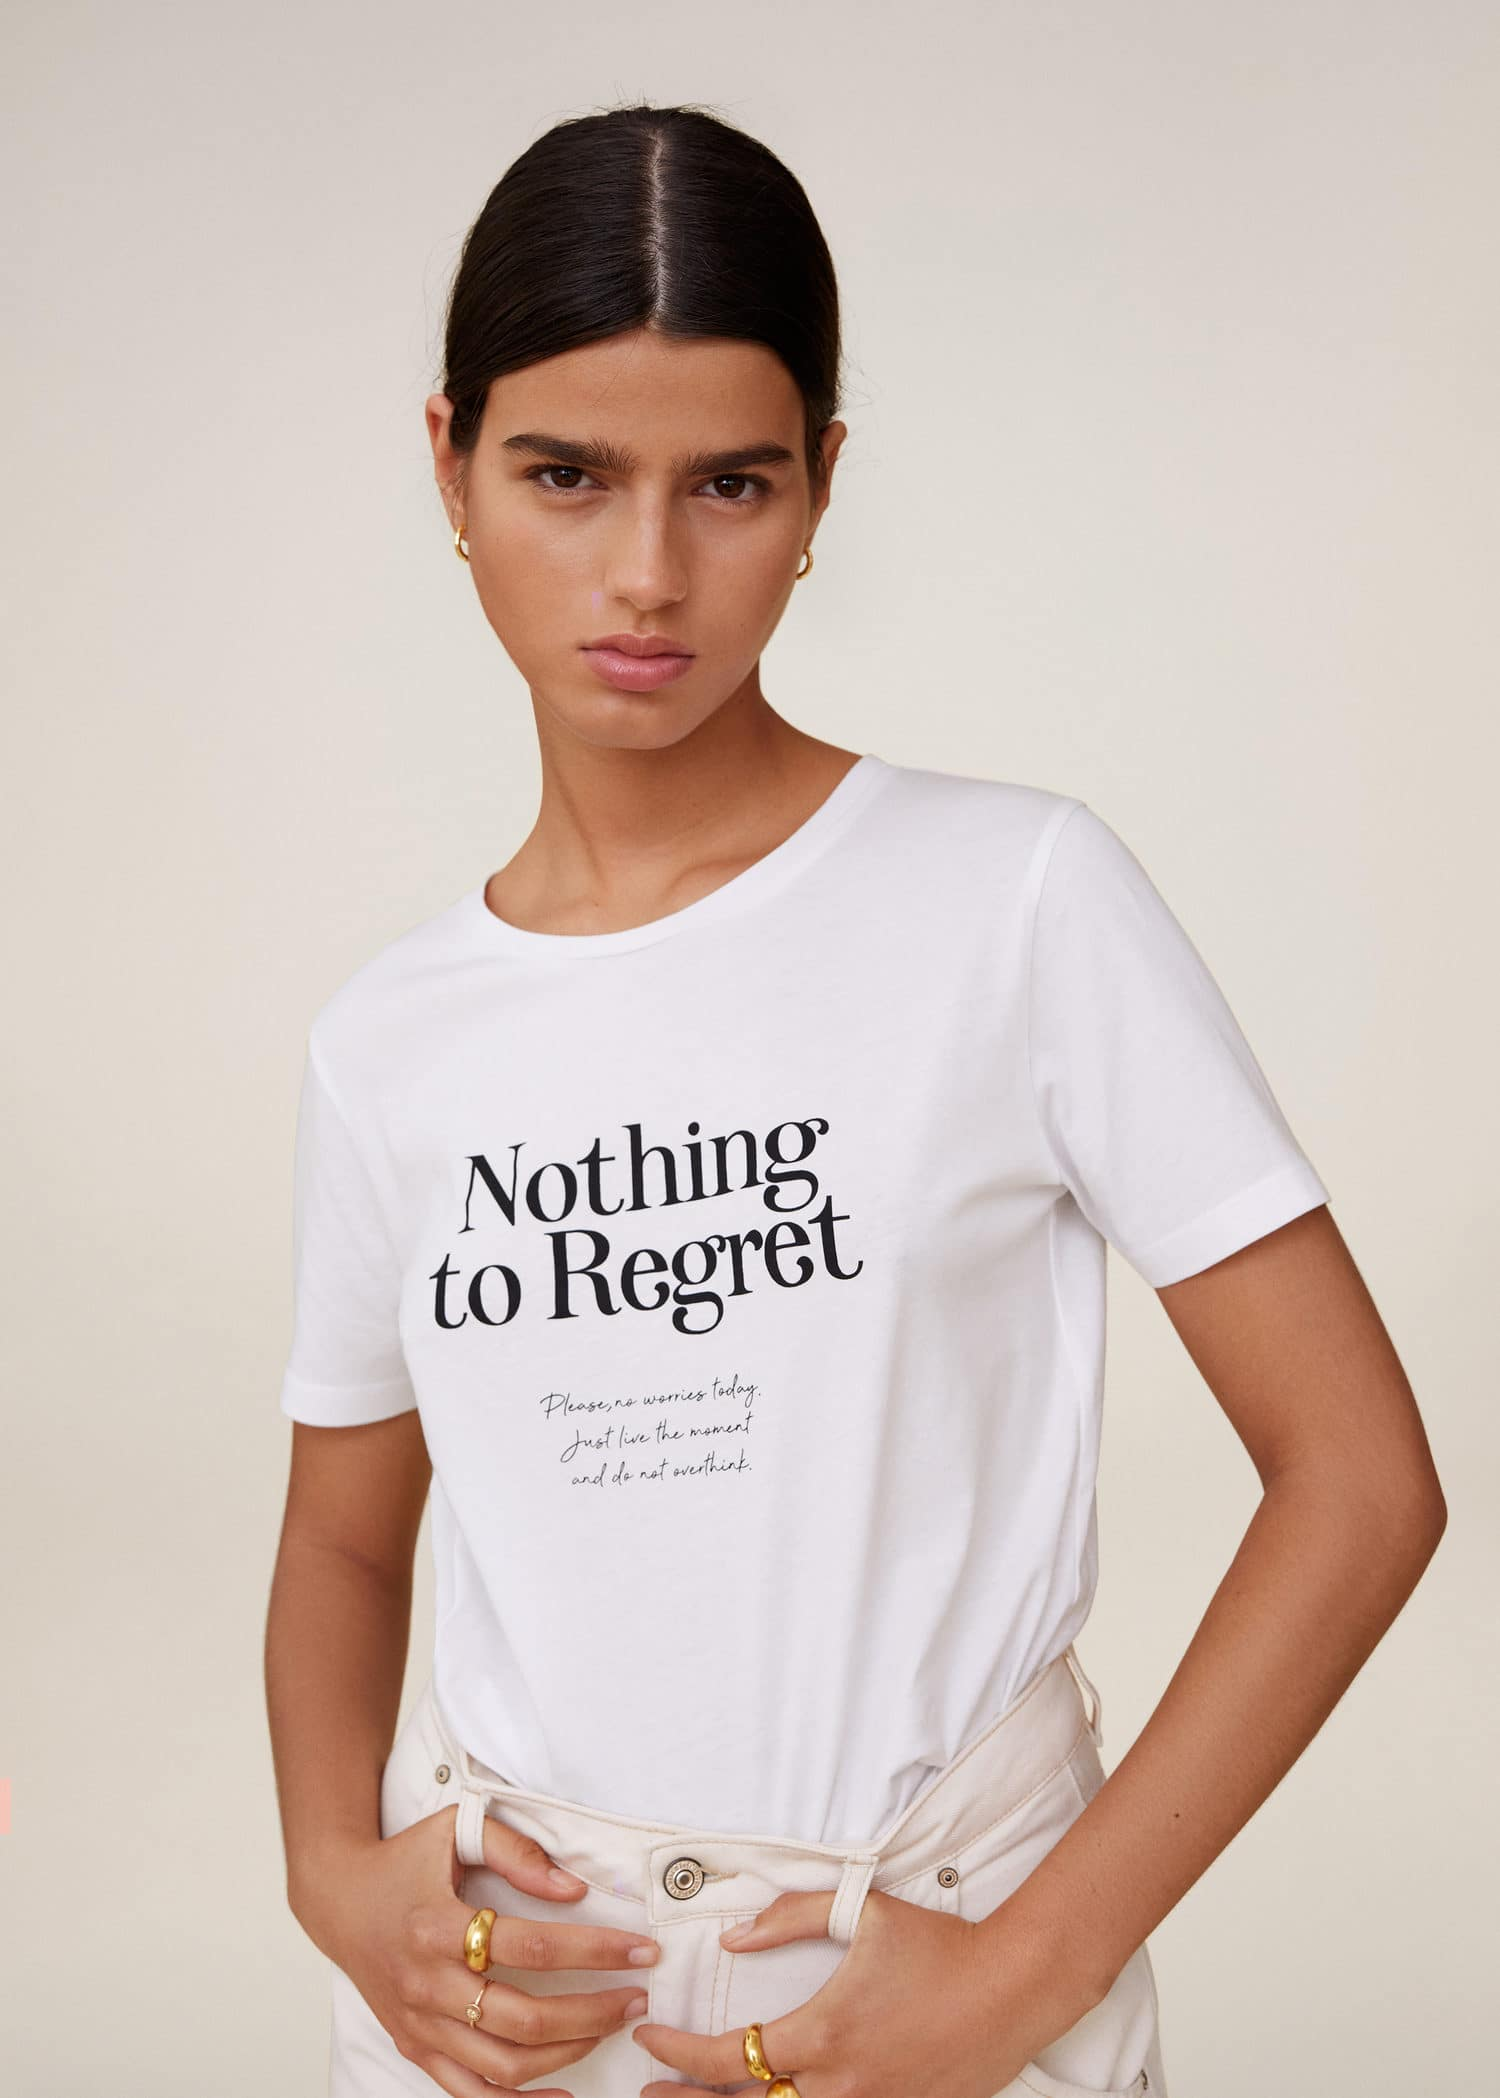 Organic Cotton Top Organic Rolled Sleeve Tee Ethical Womenswear Womens Printed Shirt Sacred Geometry Womens Geometric T-shirt